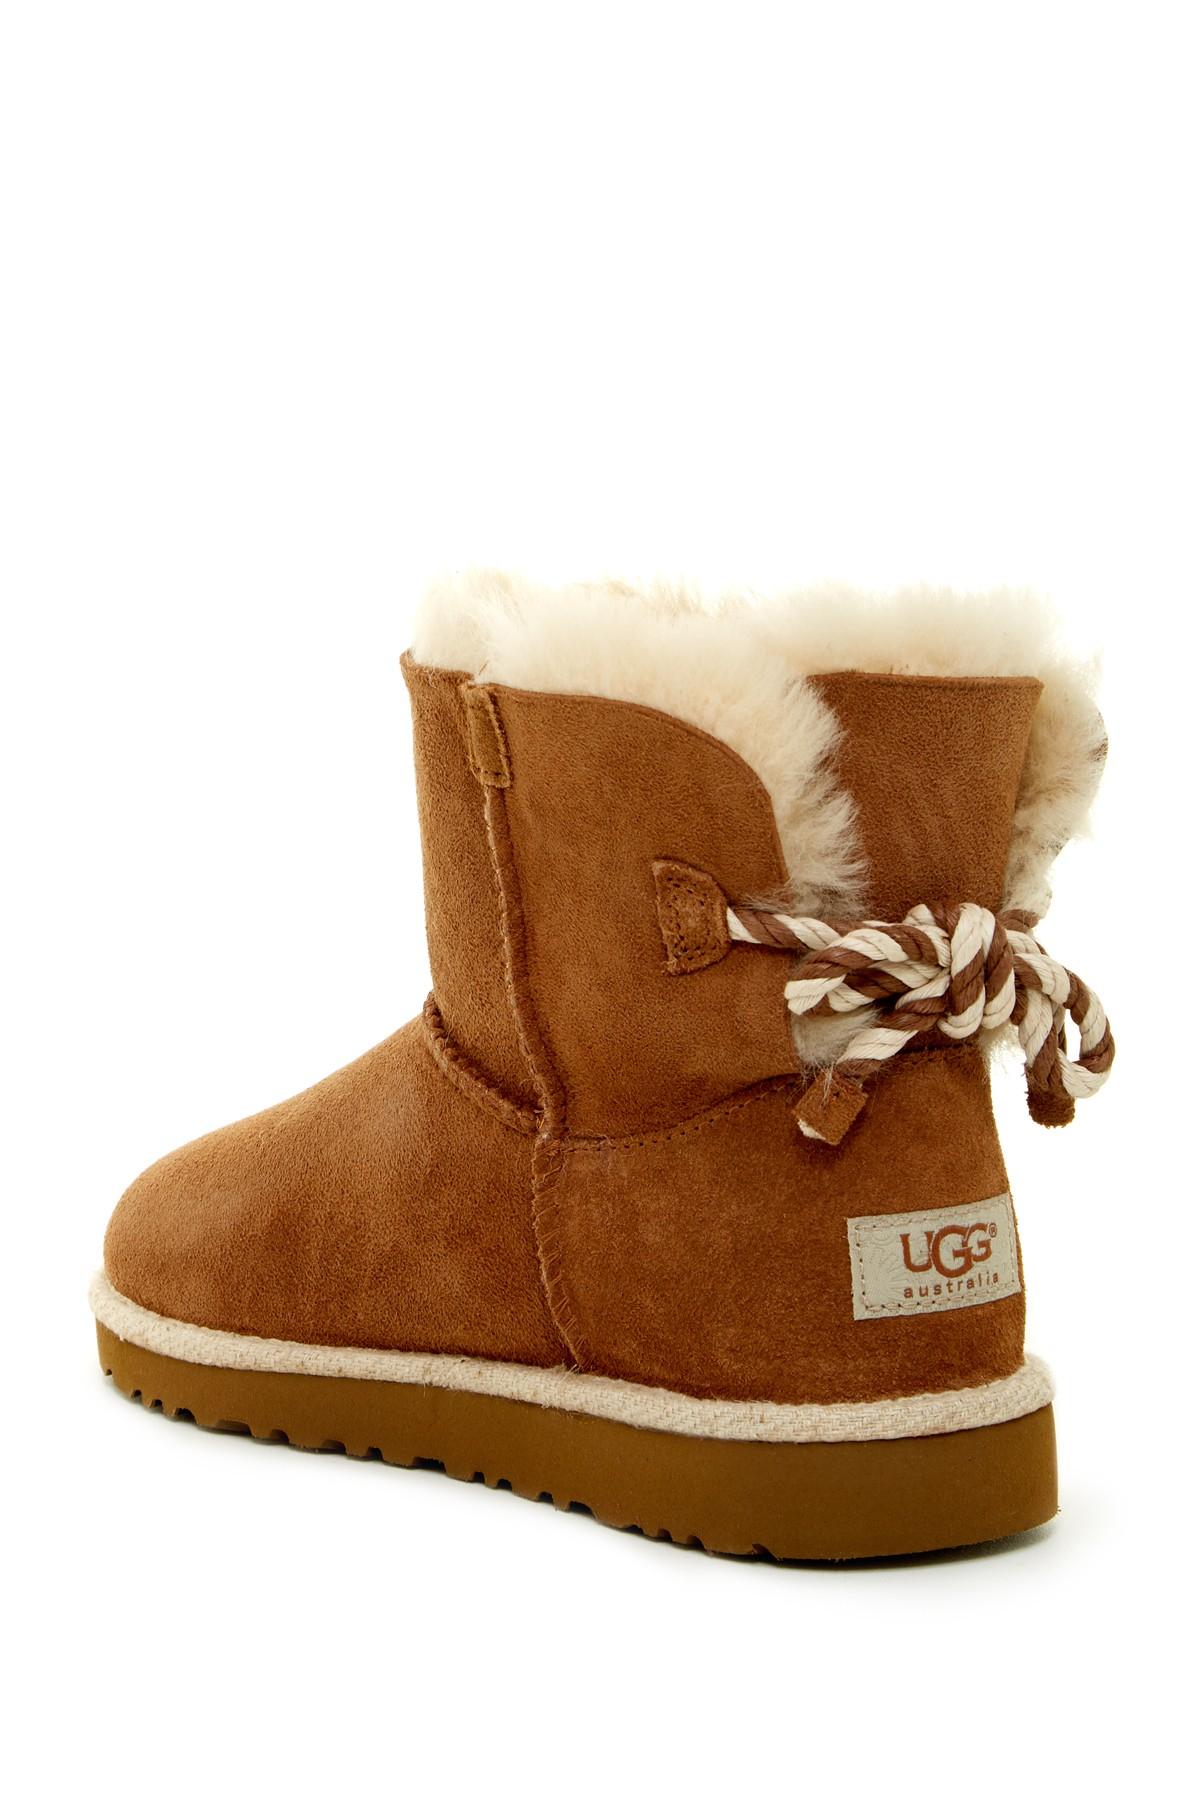 ugg slippers toronto